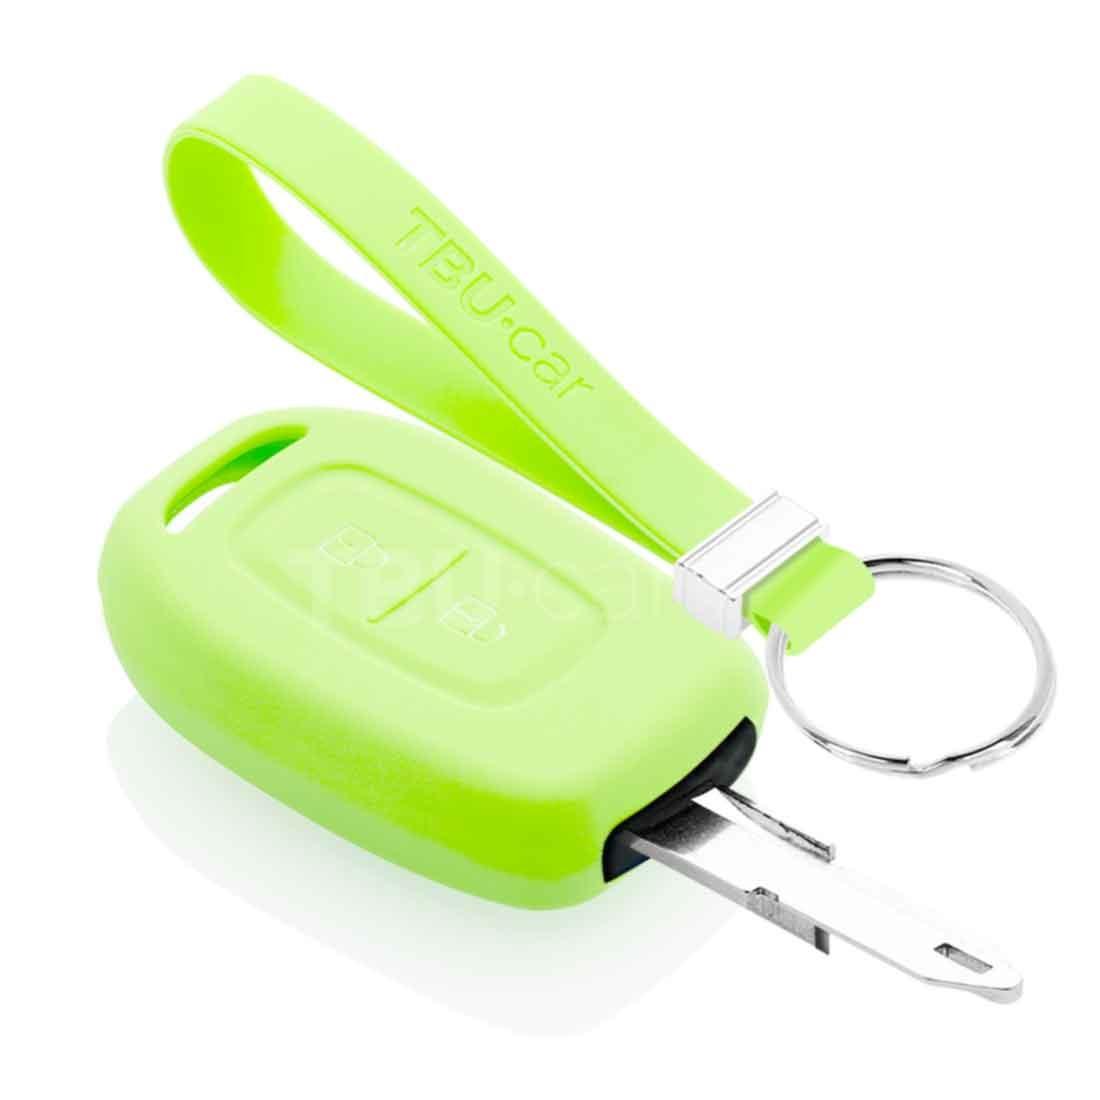 TBU car TBU car Autoschlüssel Hülle kompatibel mit Dacia 2 Tasten - Schutzhülle aus Silikon - Auto Schlüsselhülle Cover in Im Dunkeln leuchten